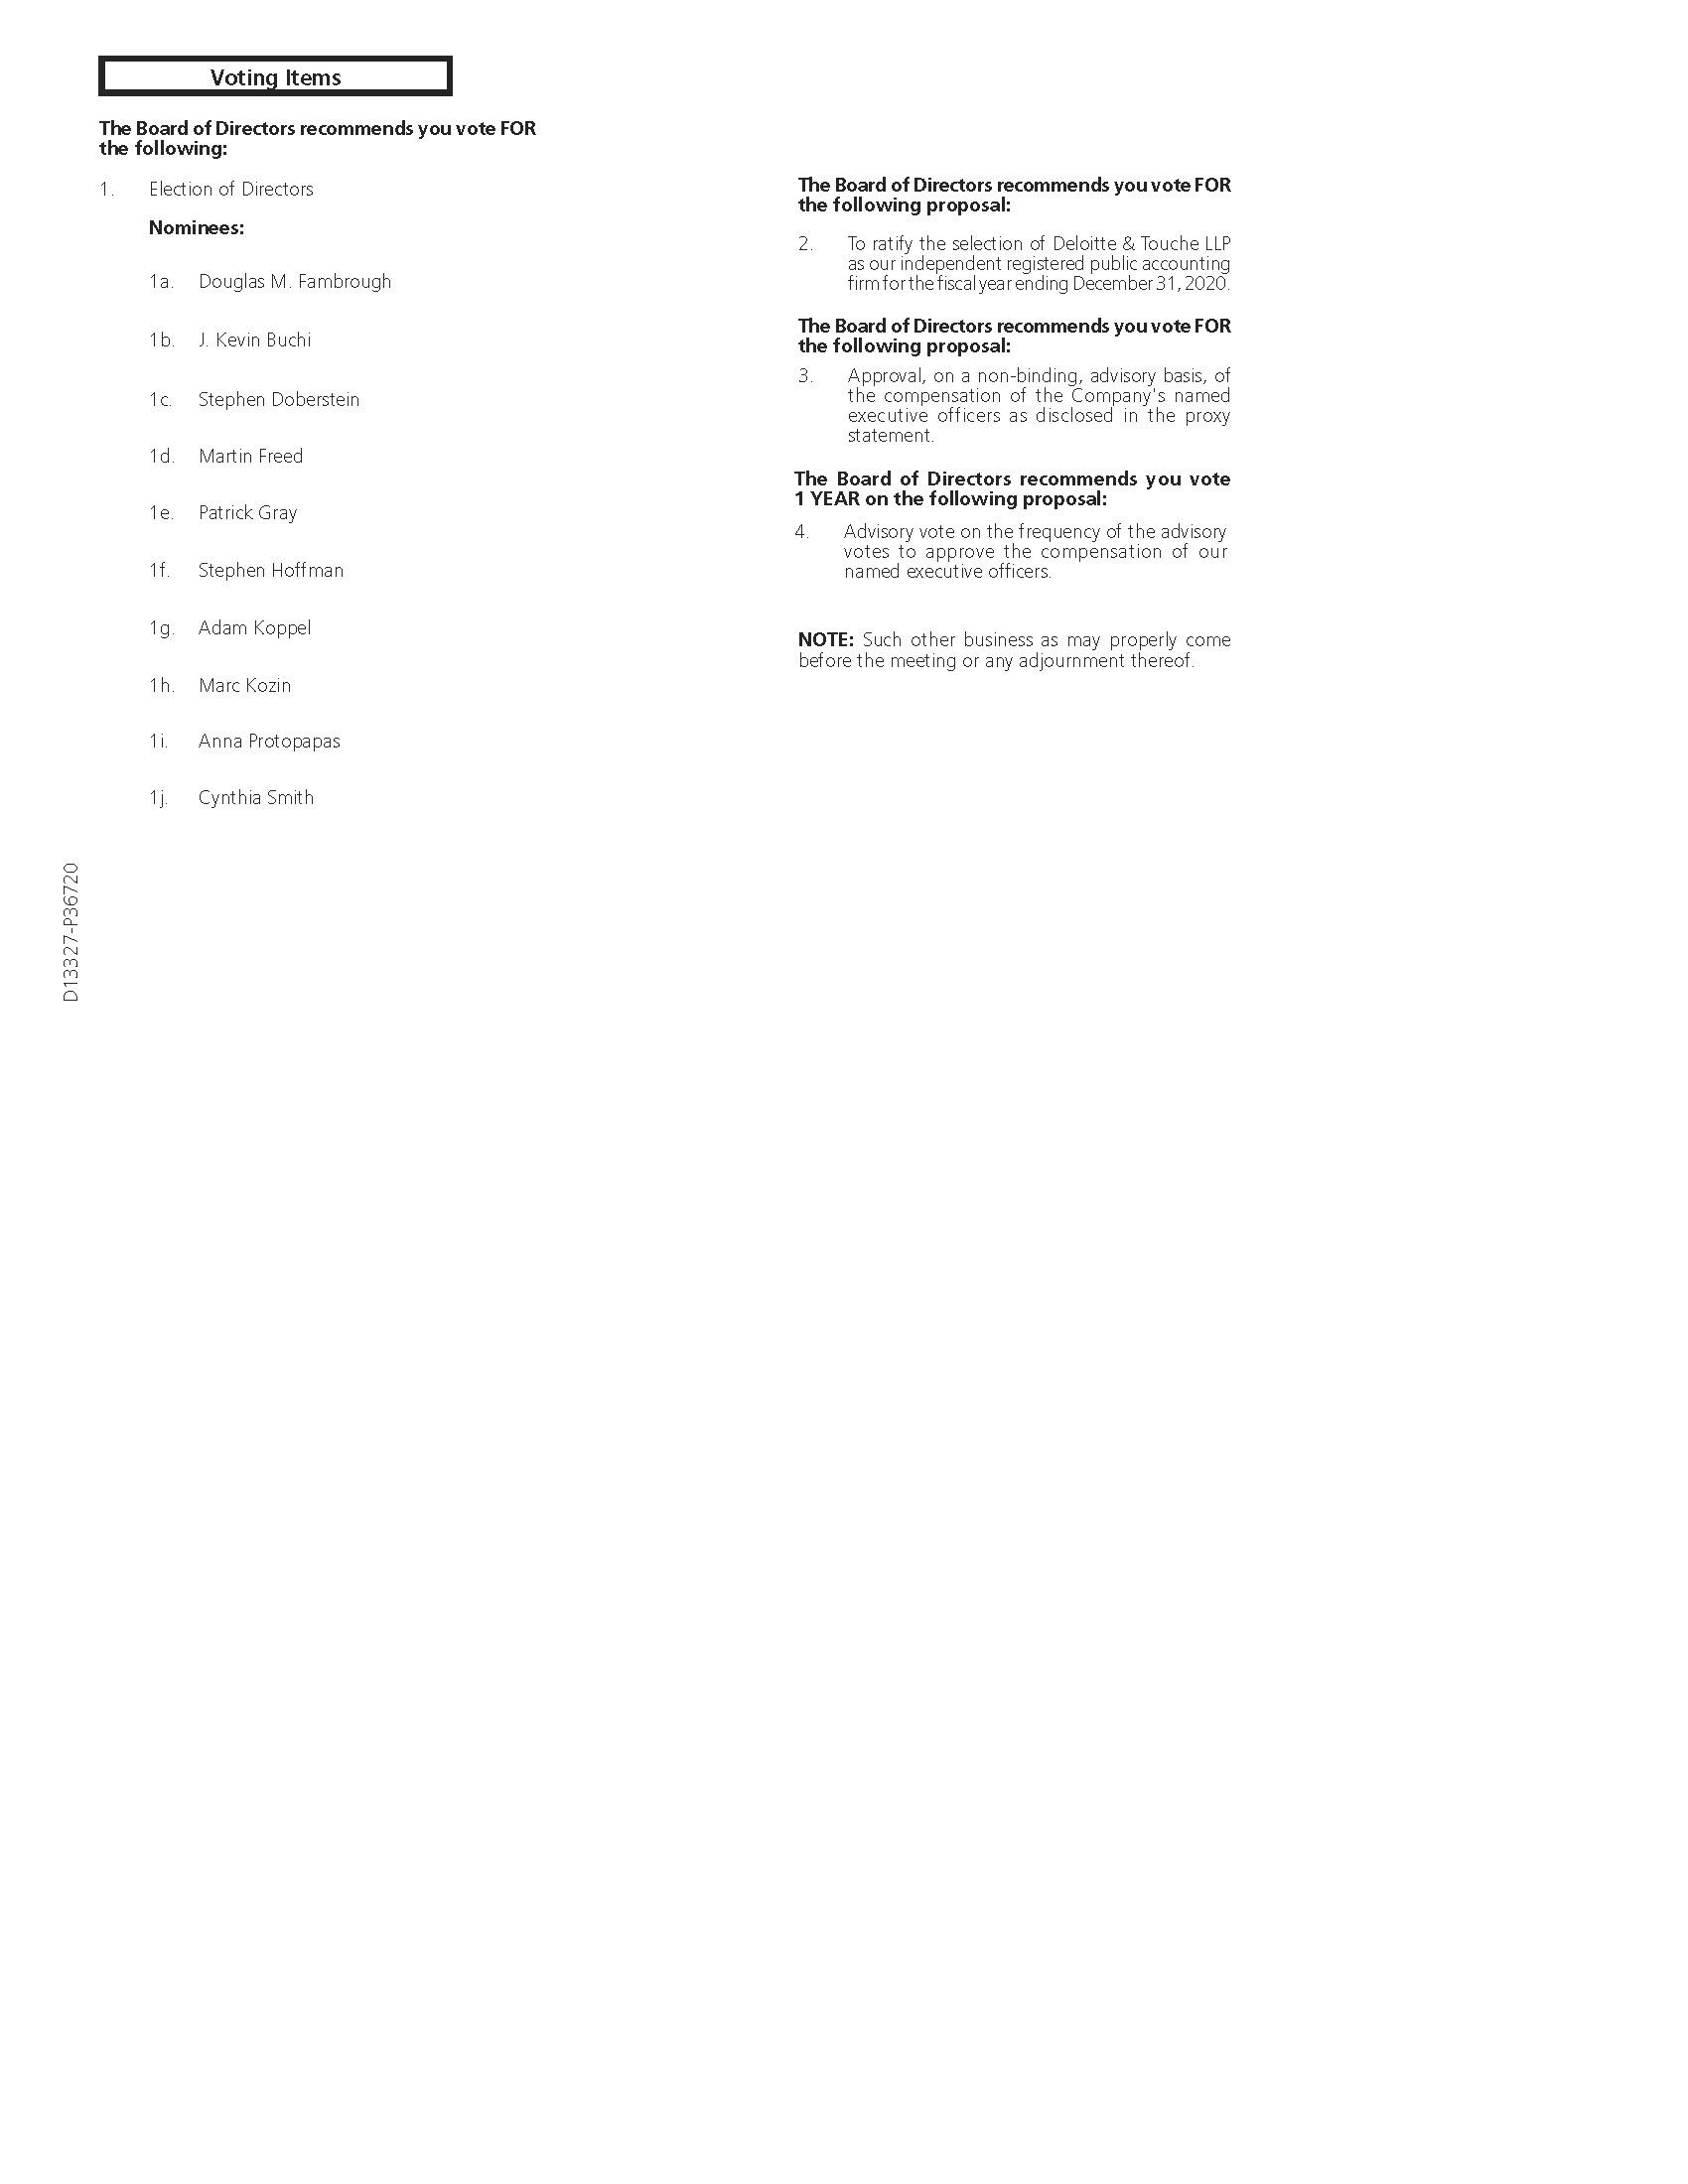 https://cdn.kscope.io/752e2b53dd8c34f79621a95ff6cefdf2-notice03.jpg